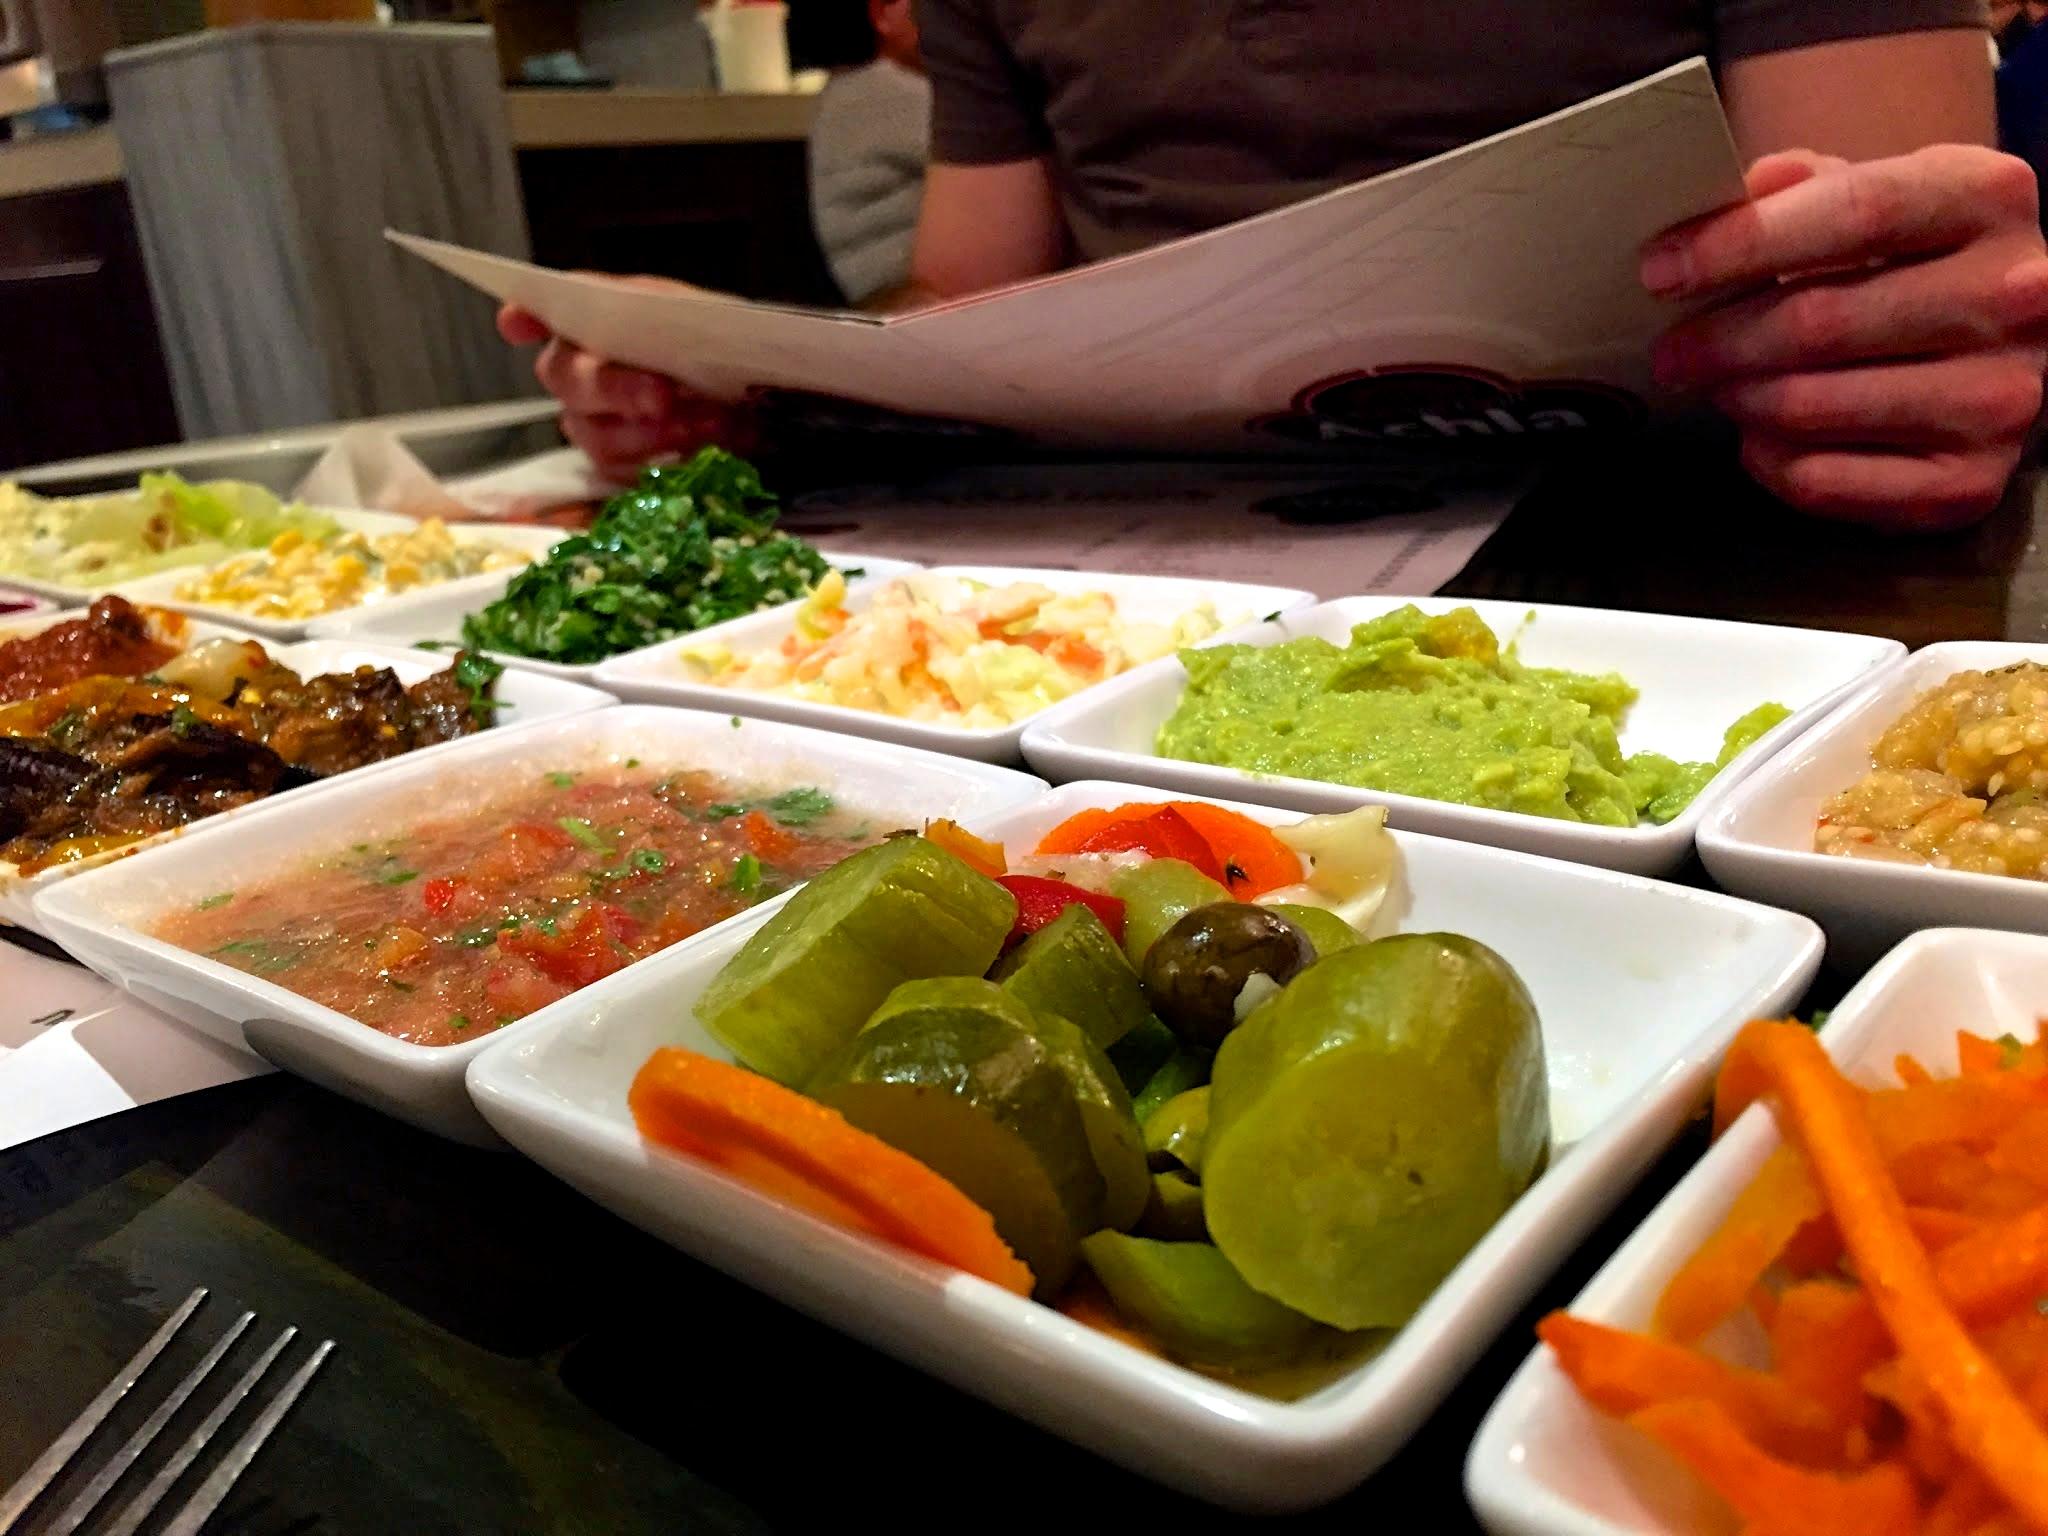 TST_sharedplates_culinaryadventures_Israel_photo#2.jpeg